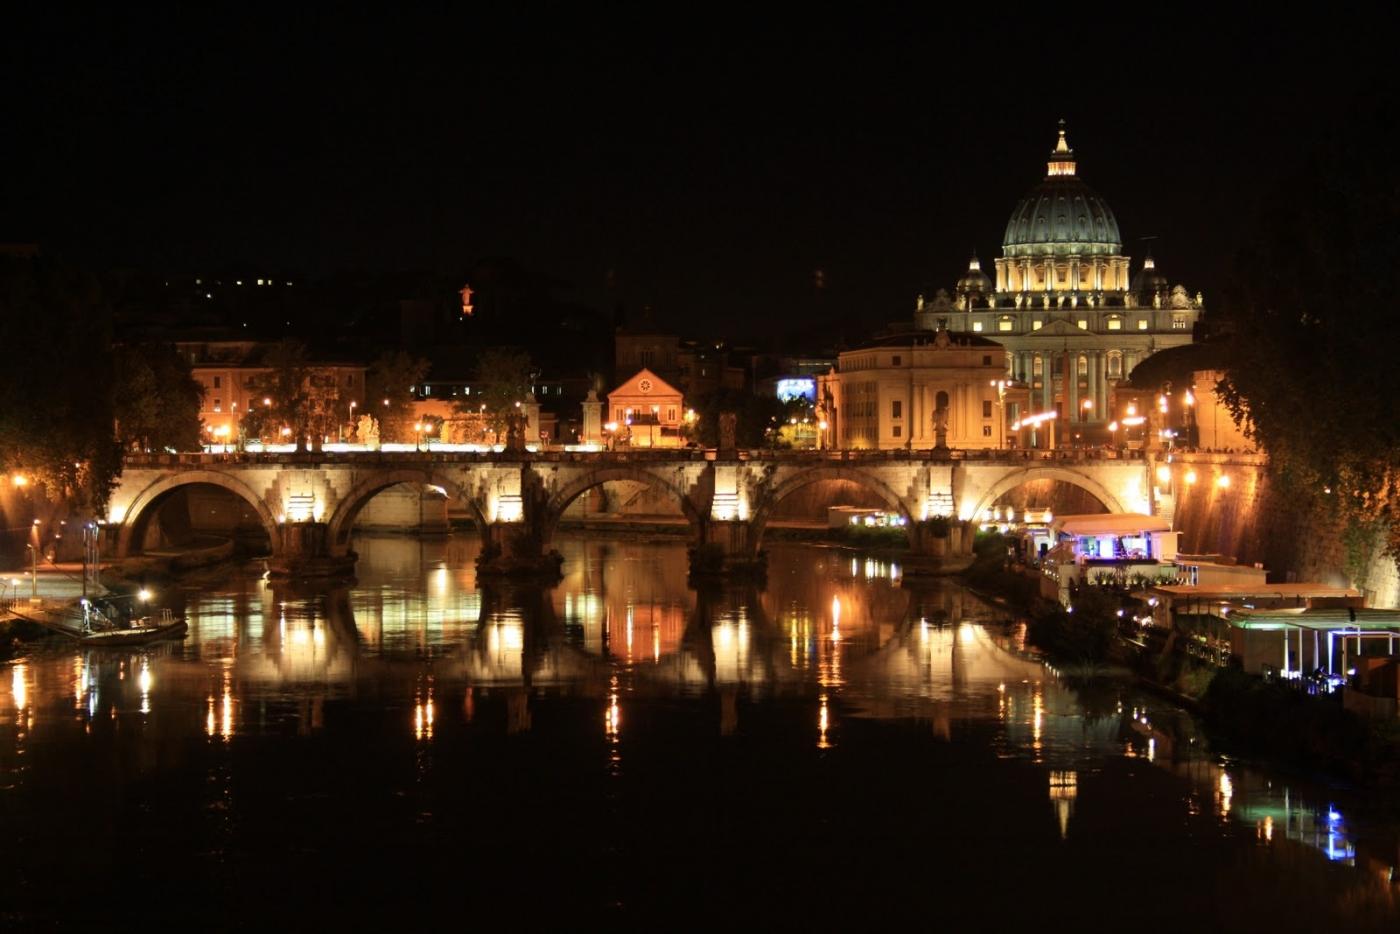 Vida nocturna de Roma 2